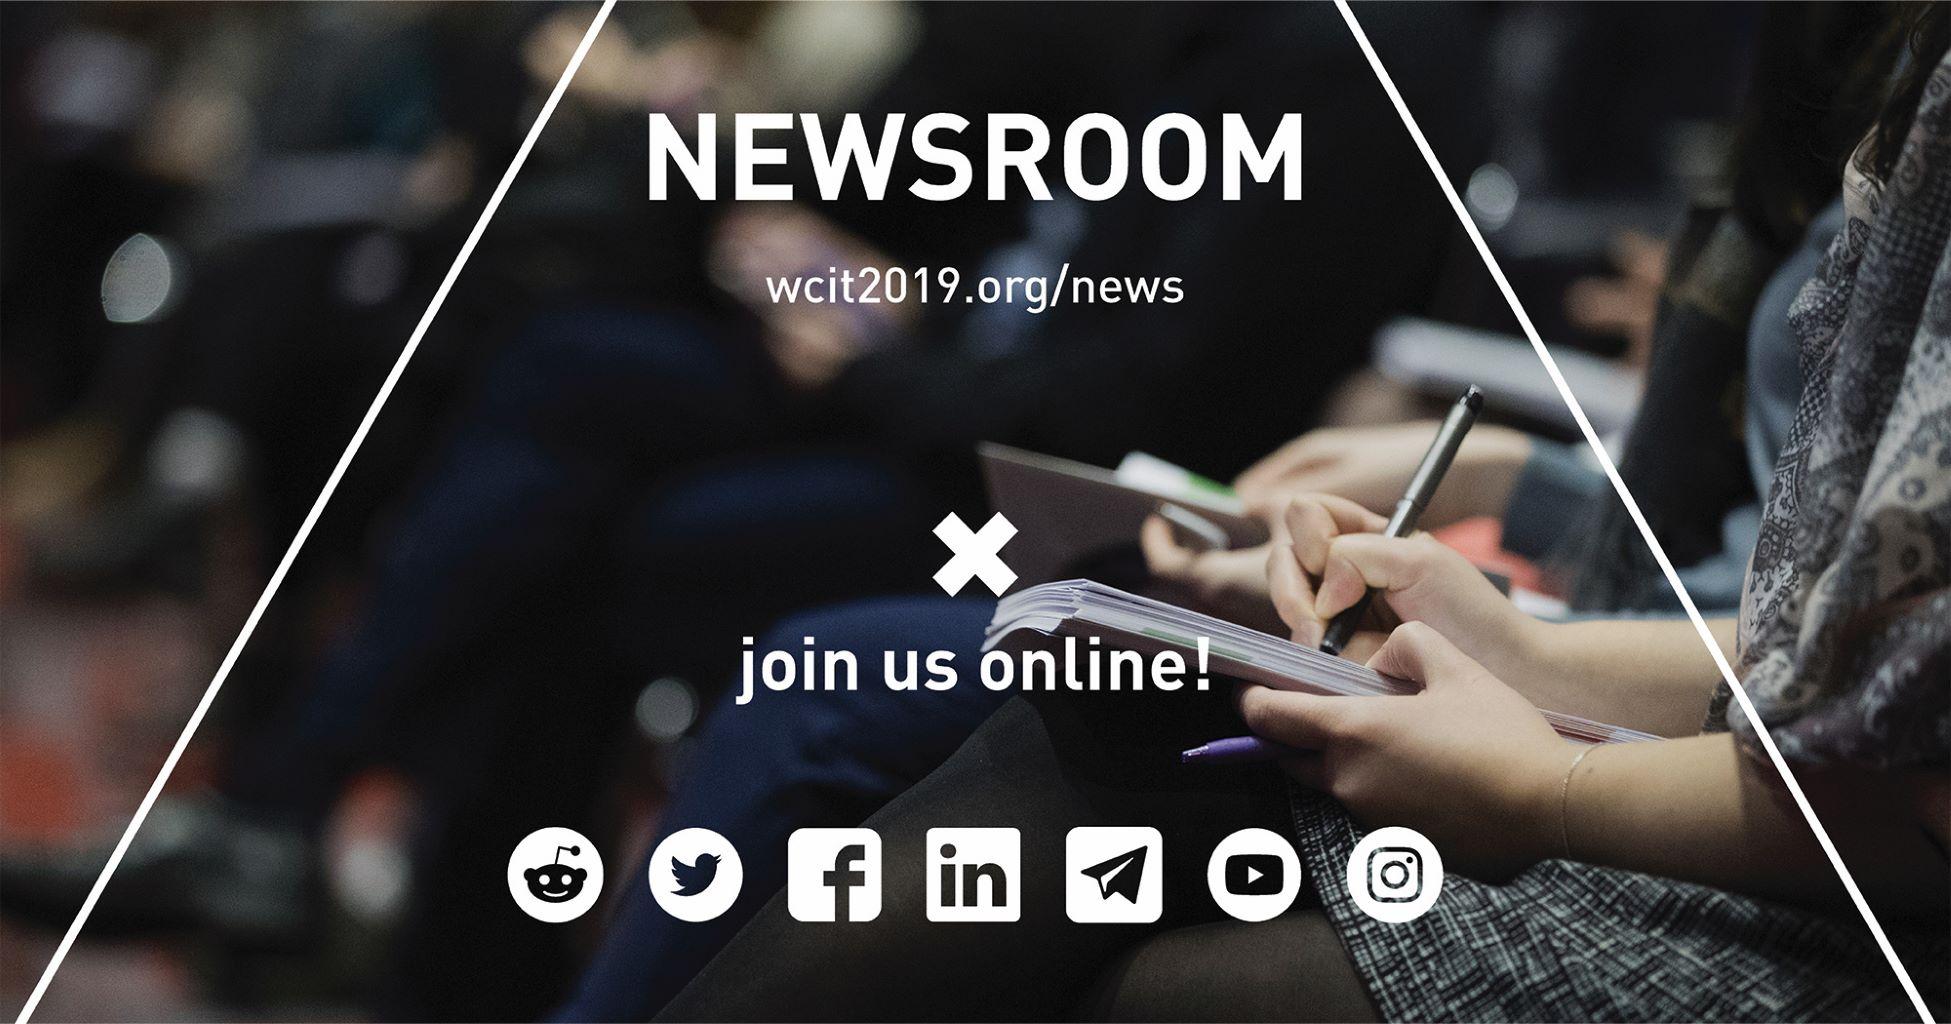 WCIT 2019 now live on all social media platforms, pre-registration in process